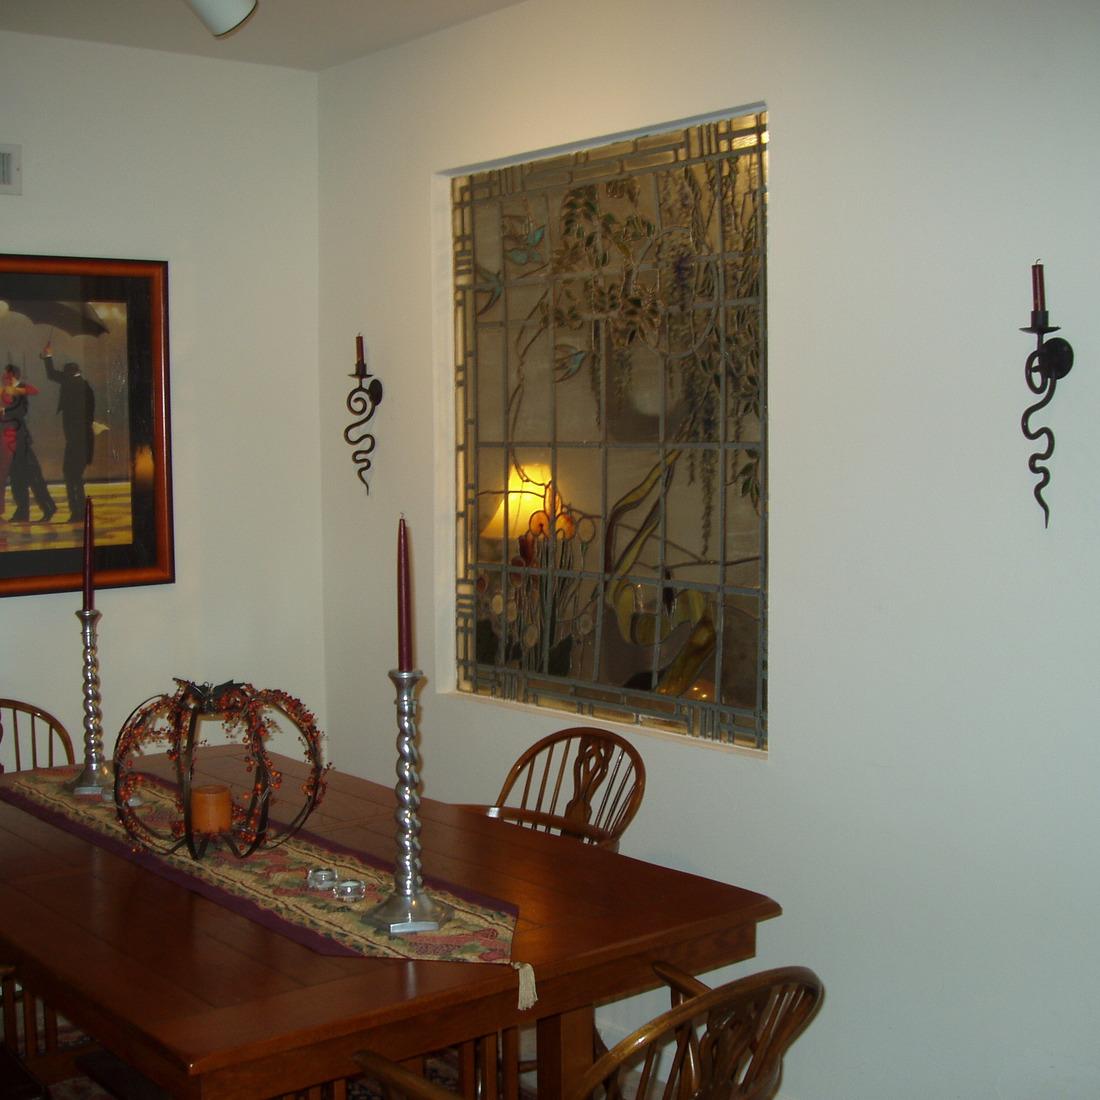 interior of 342 S. Highland Ave, Apt. 12A 3